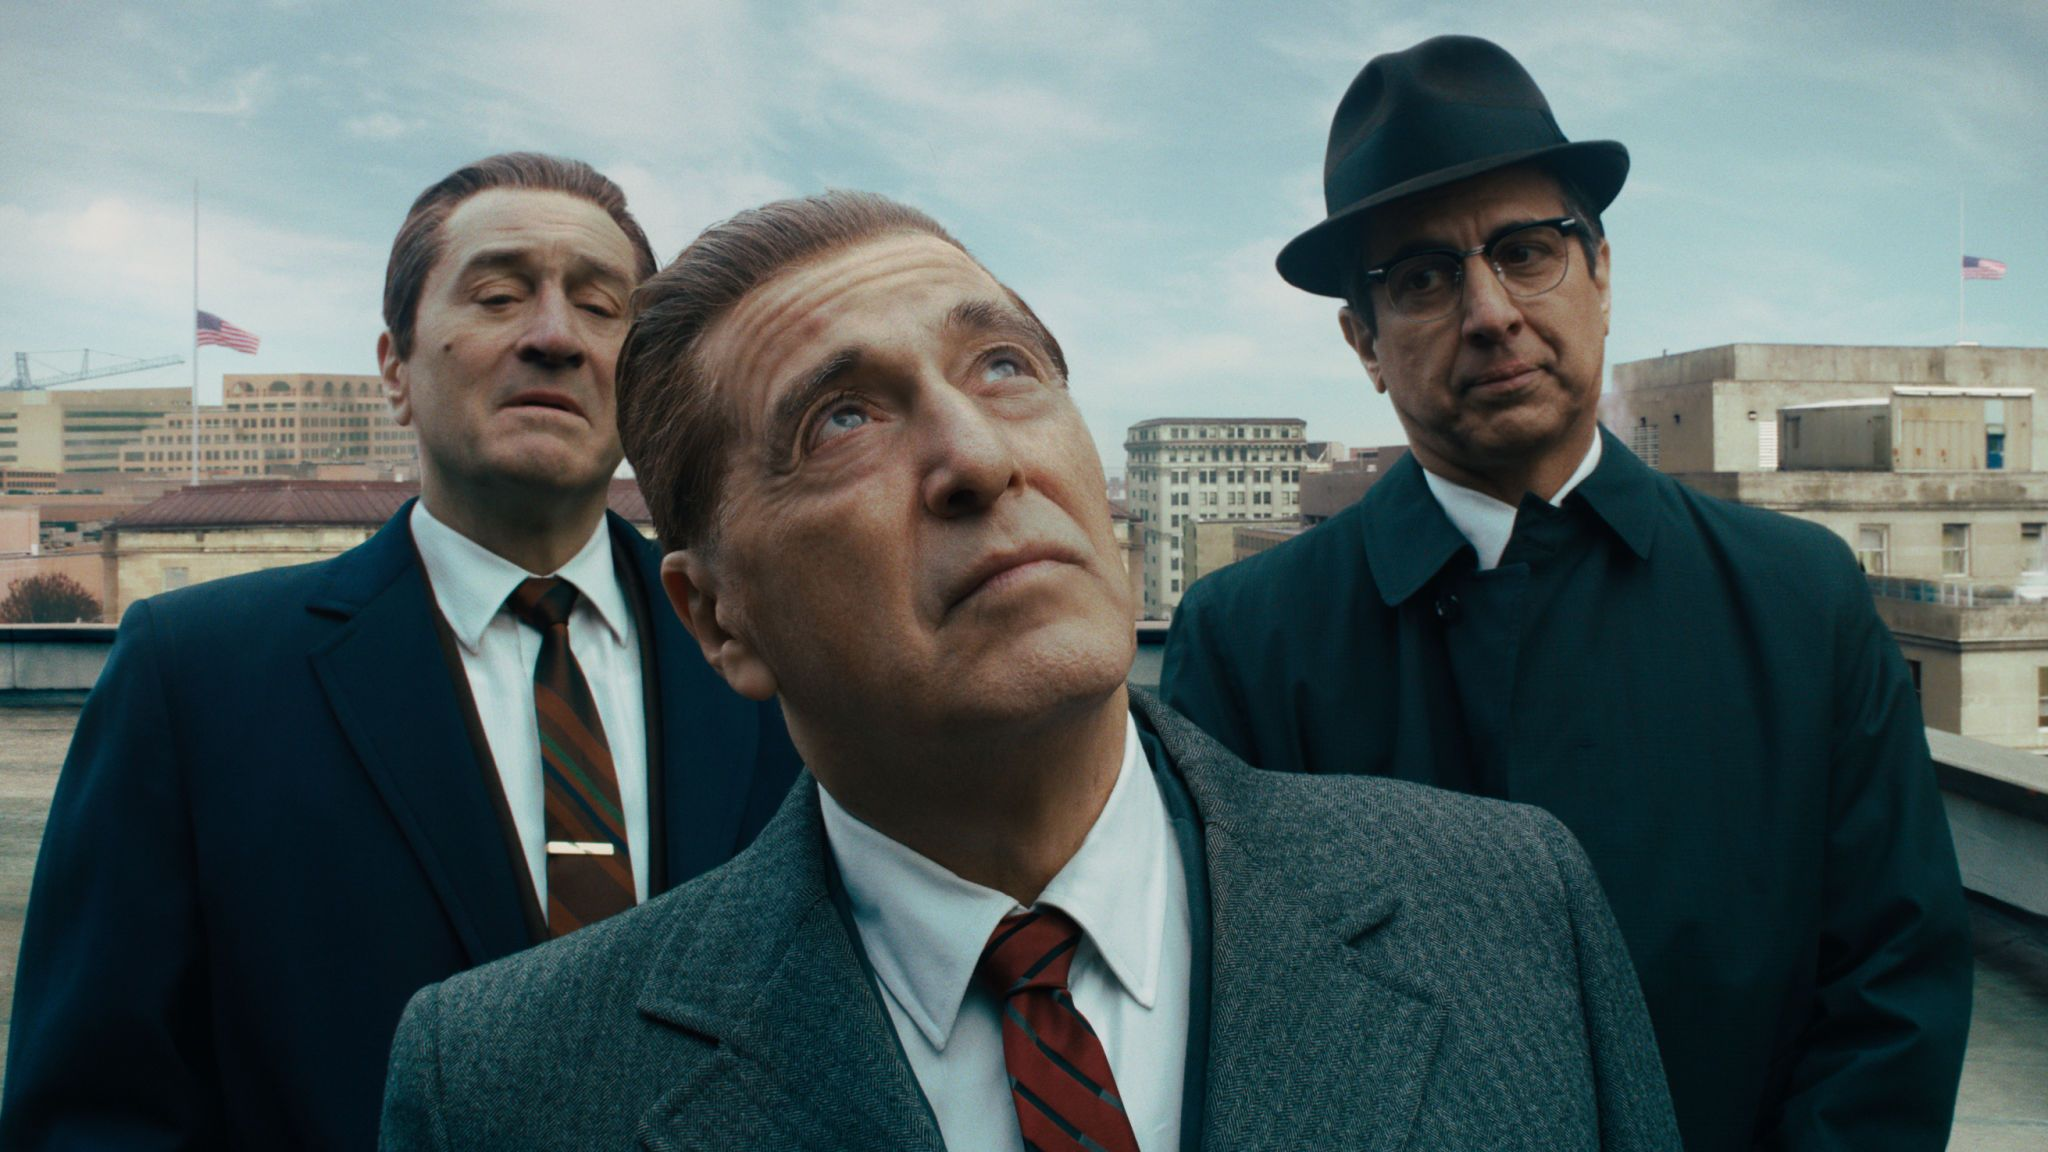 Al Pacino and Robert De Niro in The Irishman. Pic: Netflix